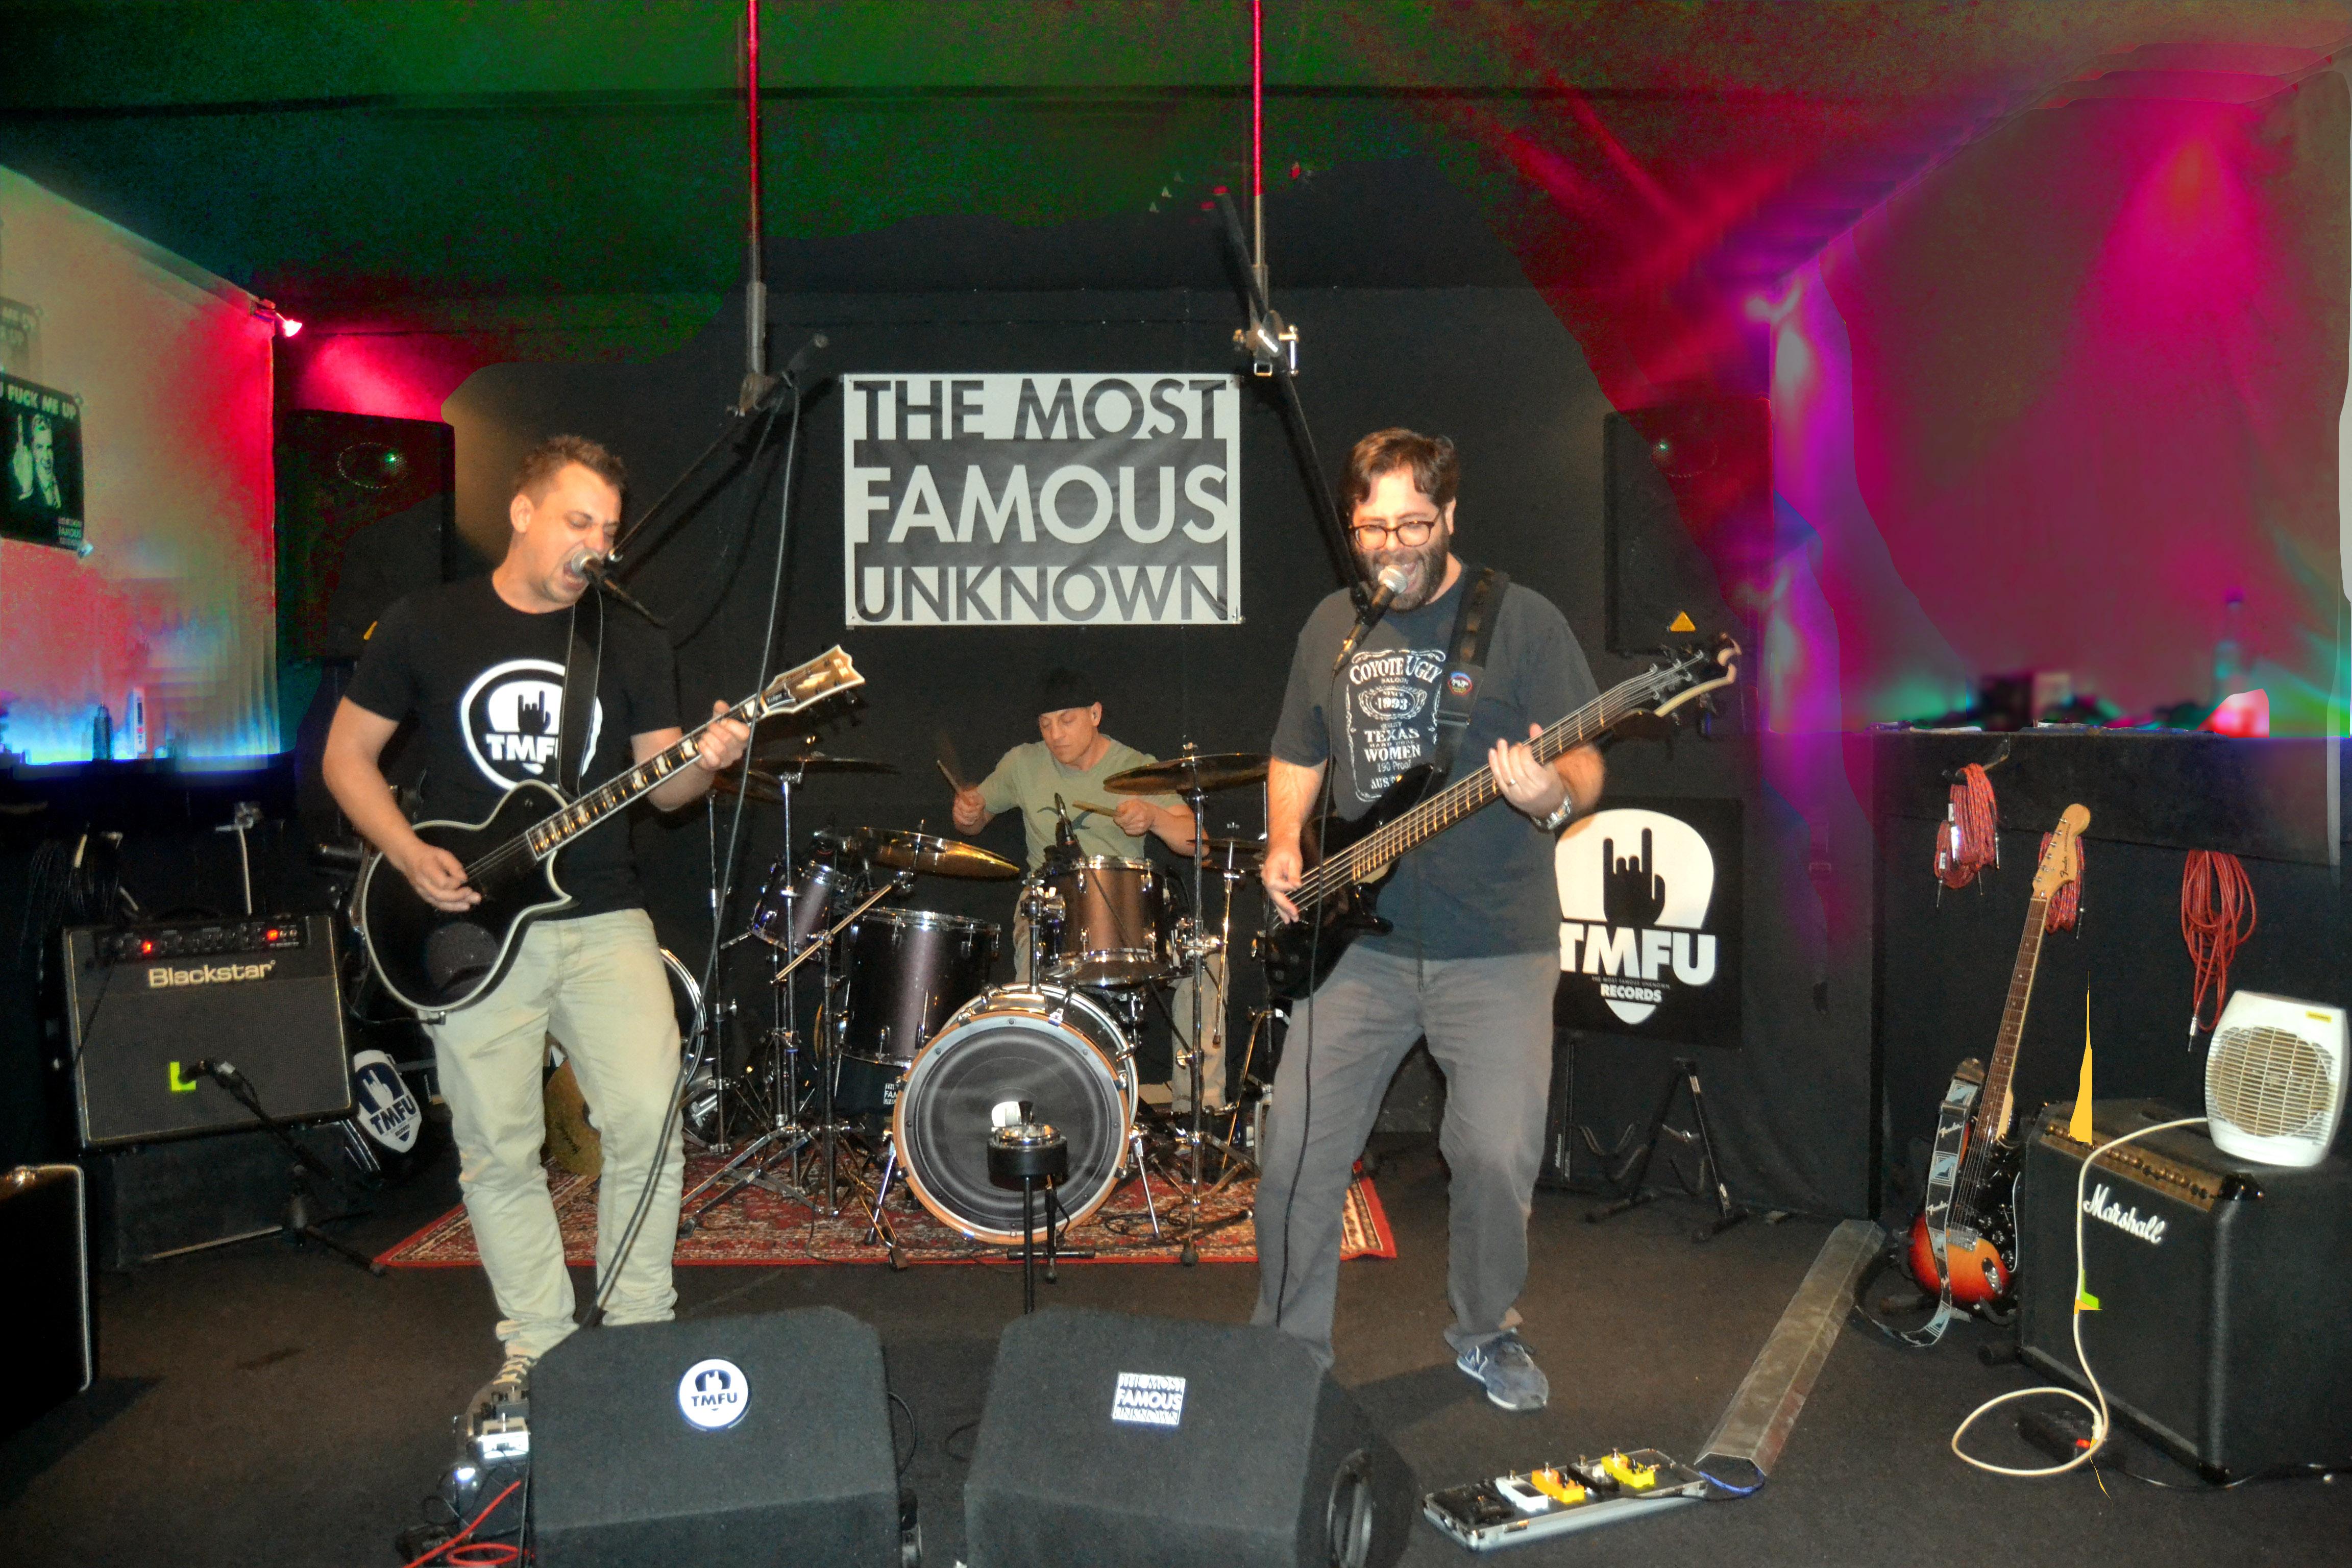 TMFU, The Most Famous Unknown, Band, Hamburg, Auftritt, Prinzenbar, Indie-Rock, Grunge, Punk, Ska, SkaPunk Band Shrooms, Bergedorf, Prinzenbar, Release, Gig, Musik, Musiker, Bergedorf Blog